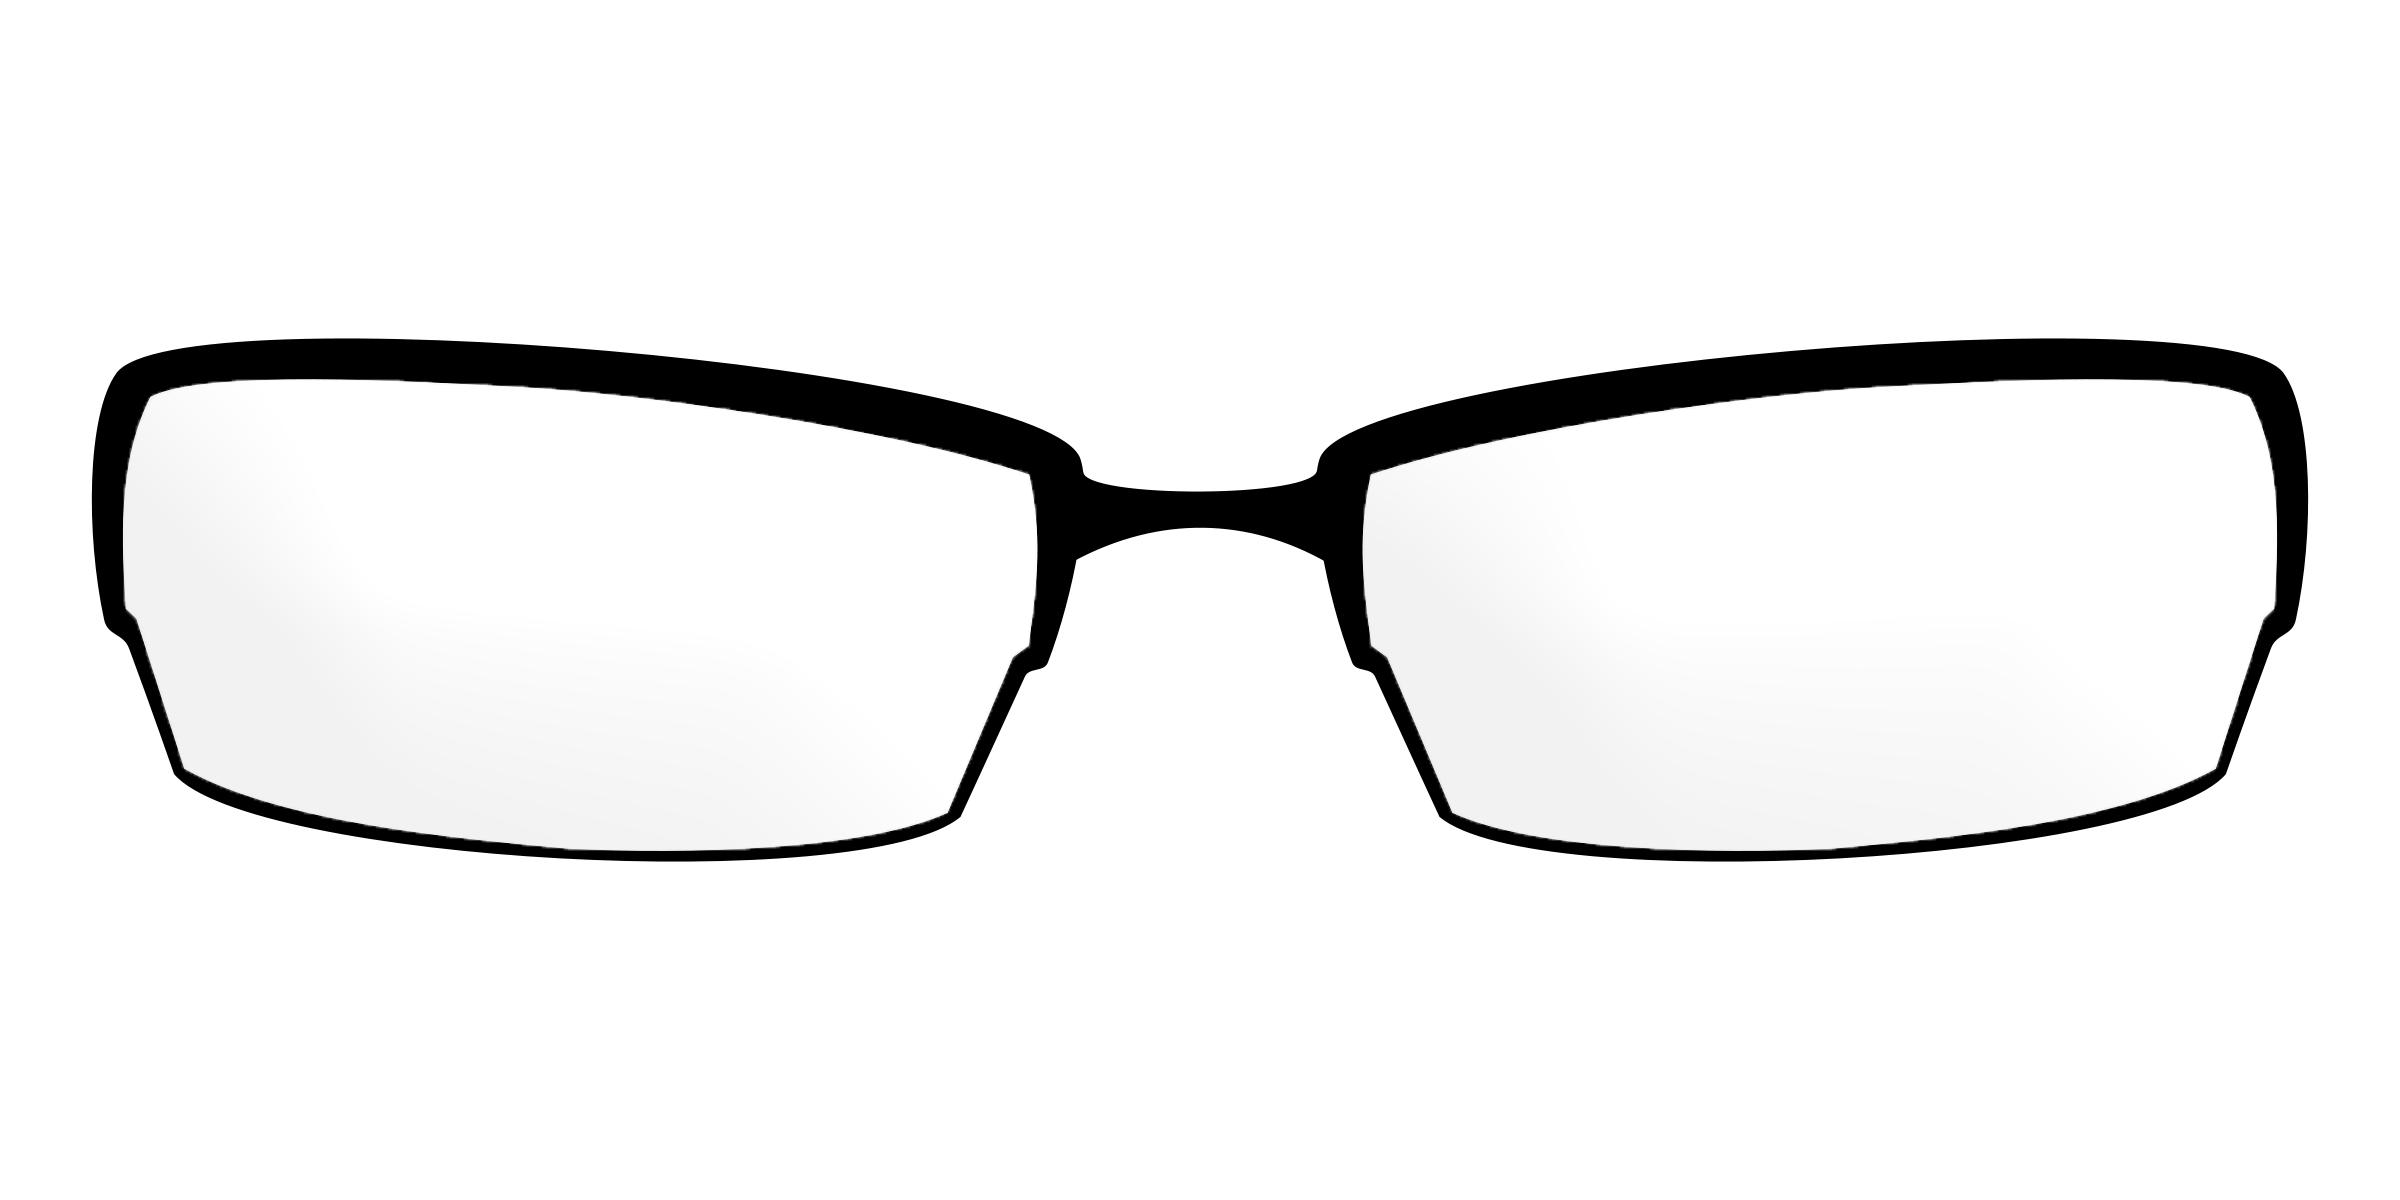 Clipart sunglasses brown, Clipart sunglasses brown.